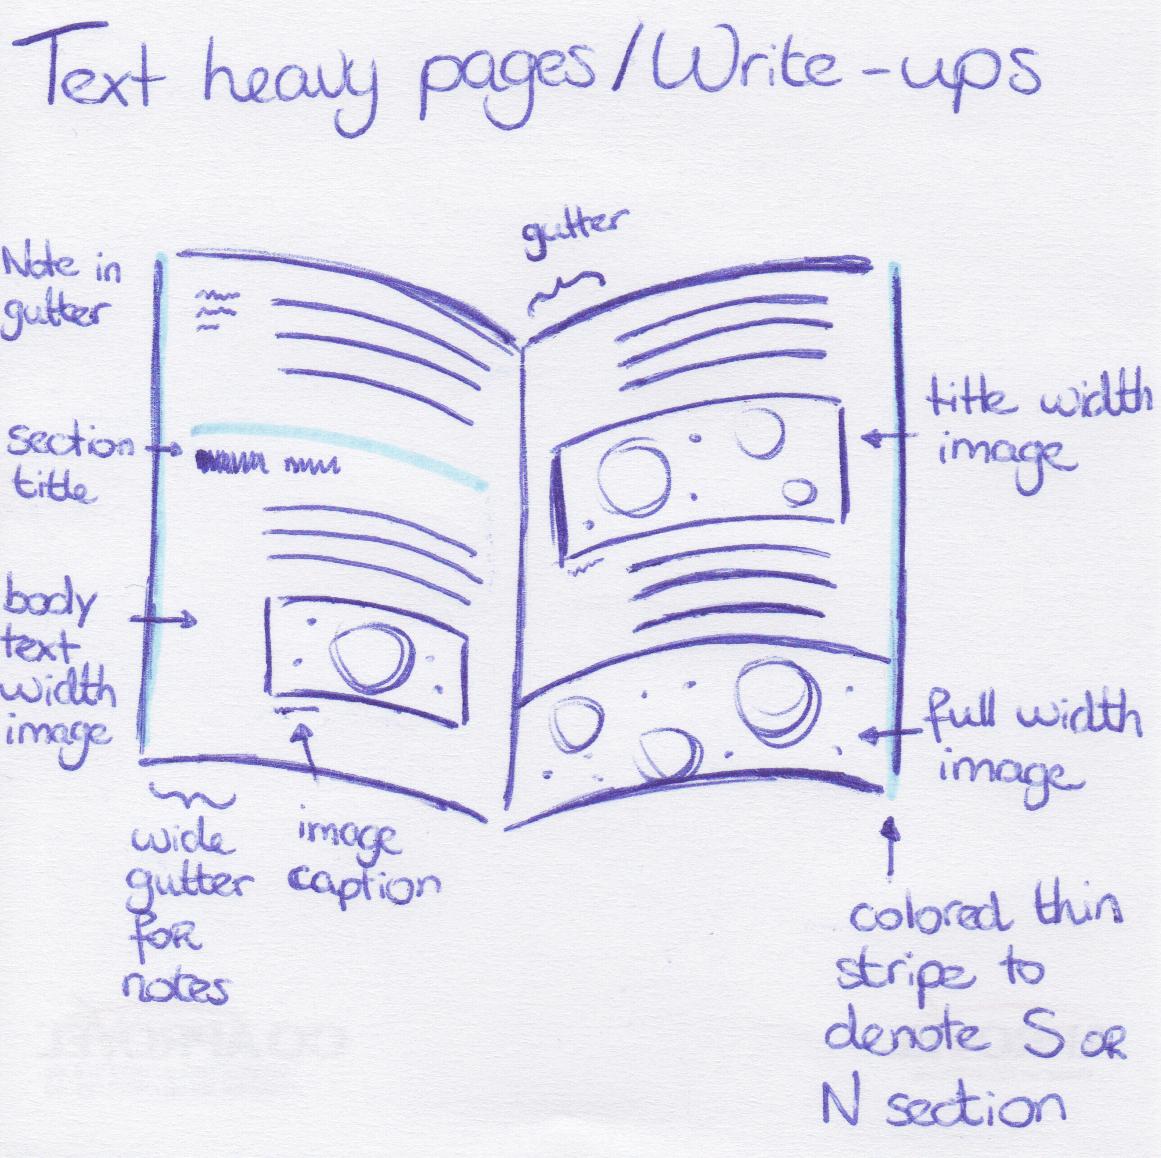 Data Sketches - Write-ups